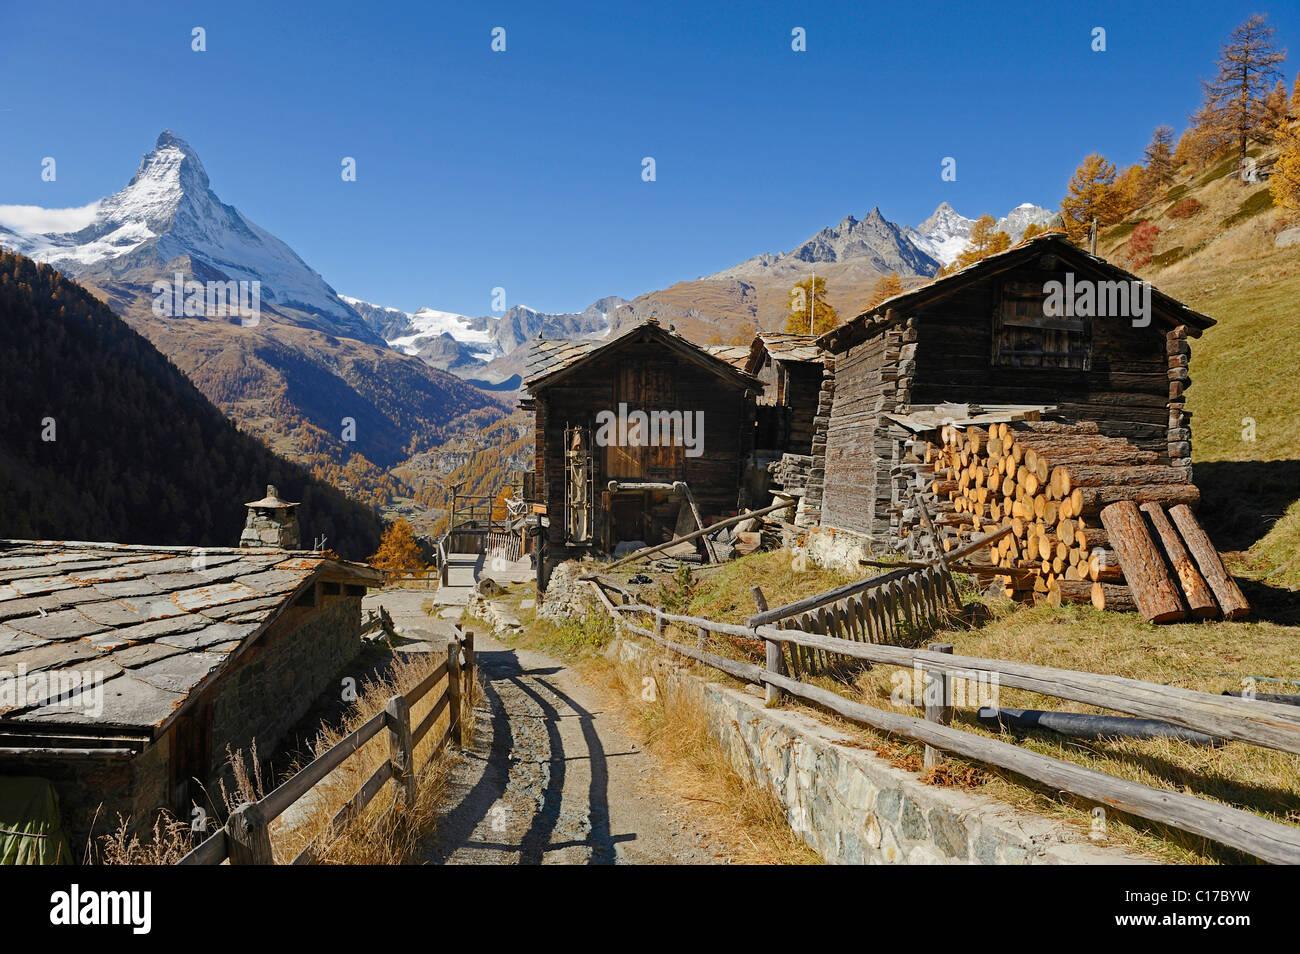 Hamlet Findeln with Matterhorn at the back, Zermatt, Valais, Switzerland, Europe - Stock Image